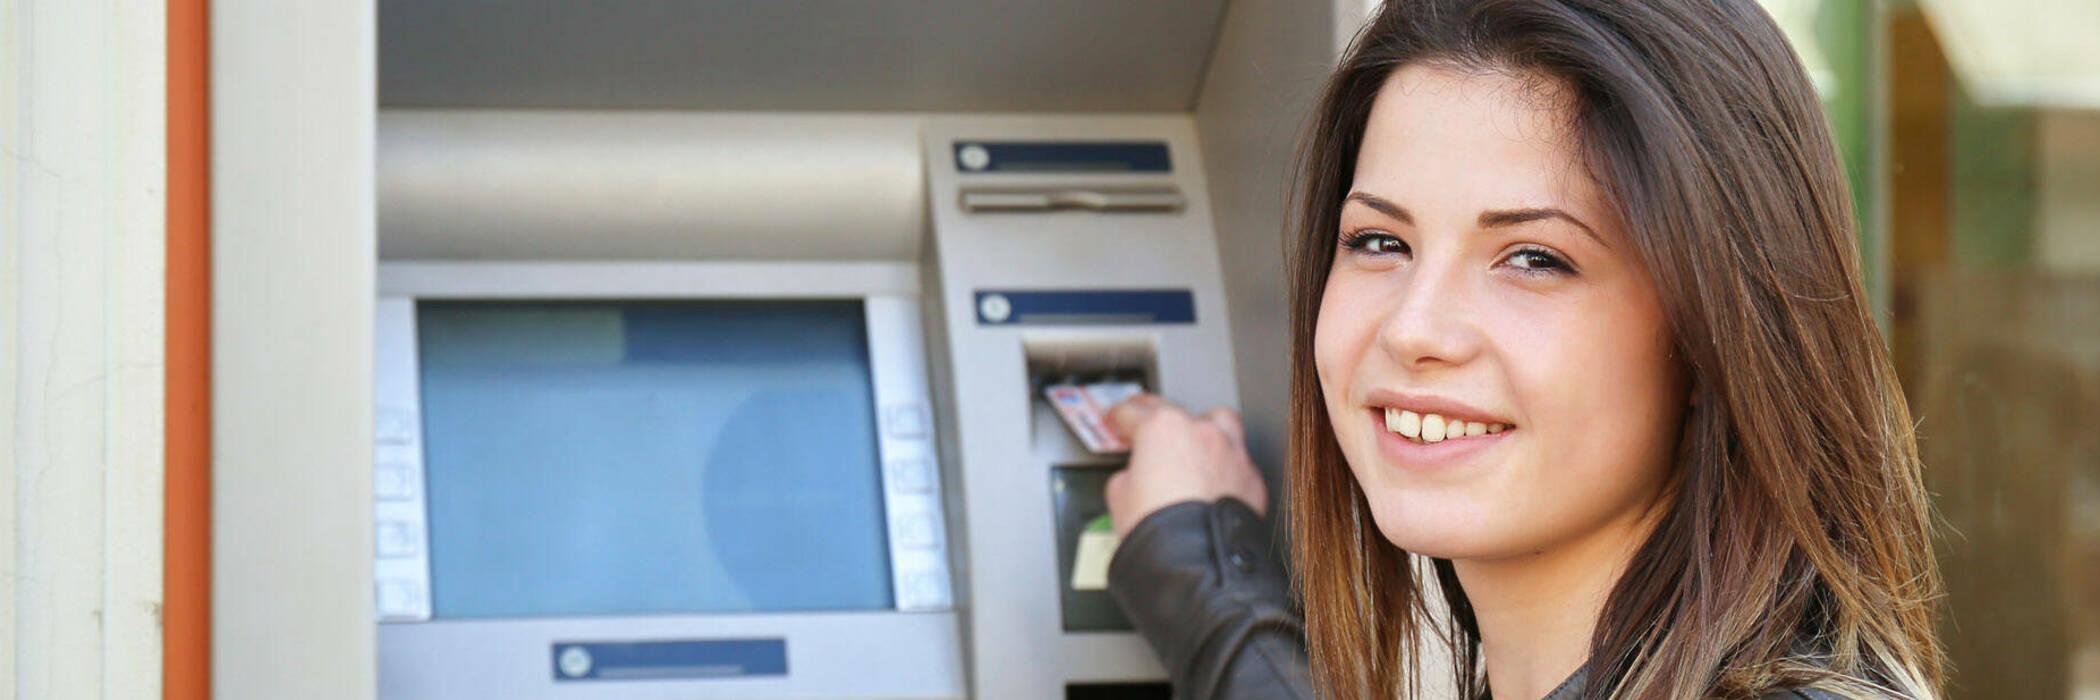 Woman inserting card into cash machine